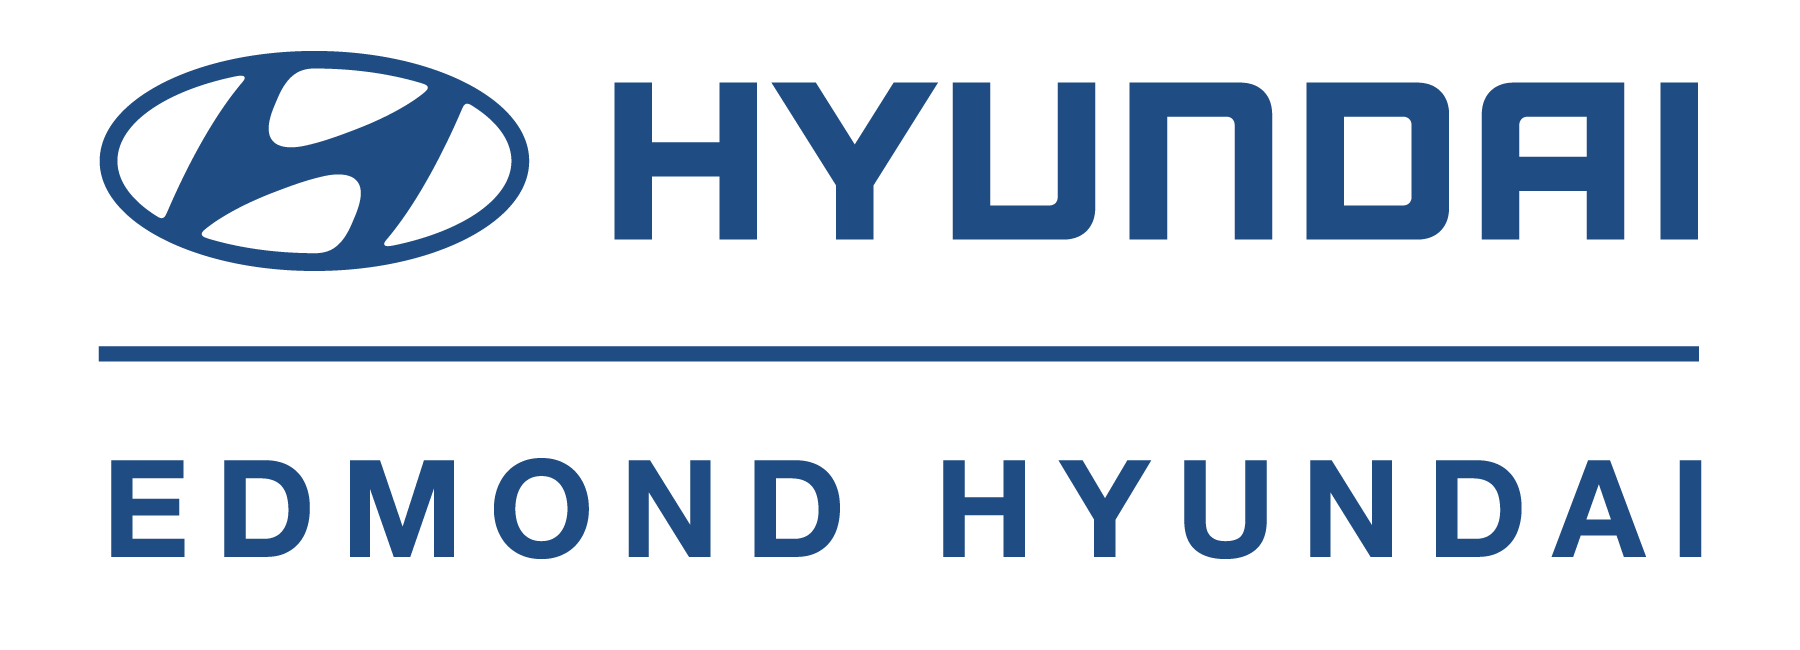 Edmond Hyundai Logo